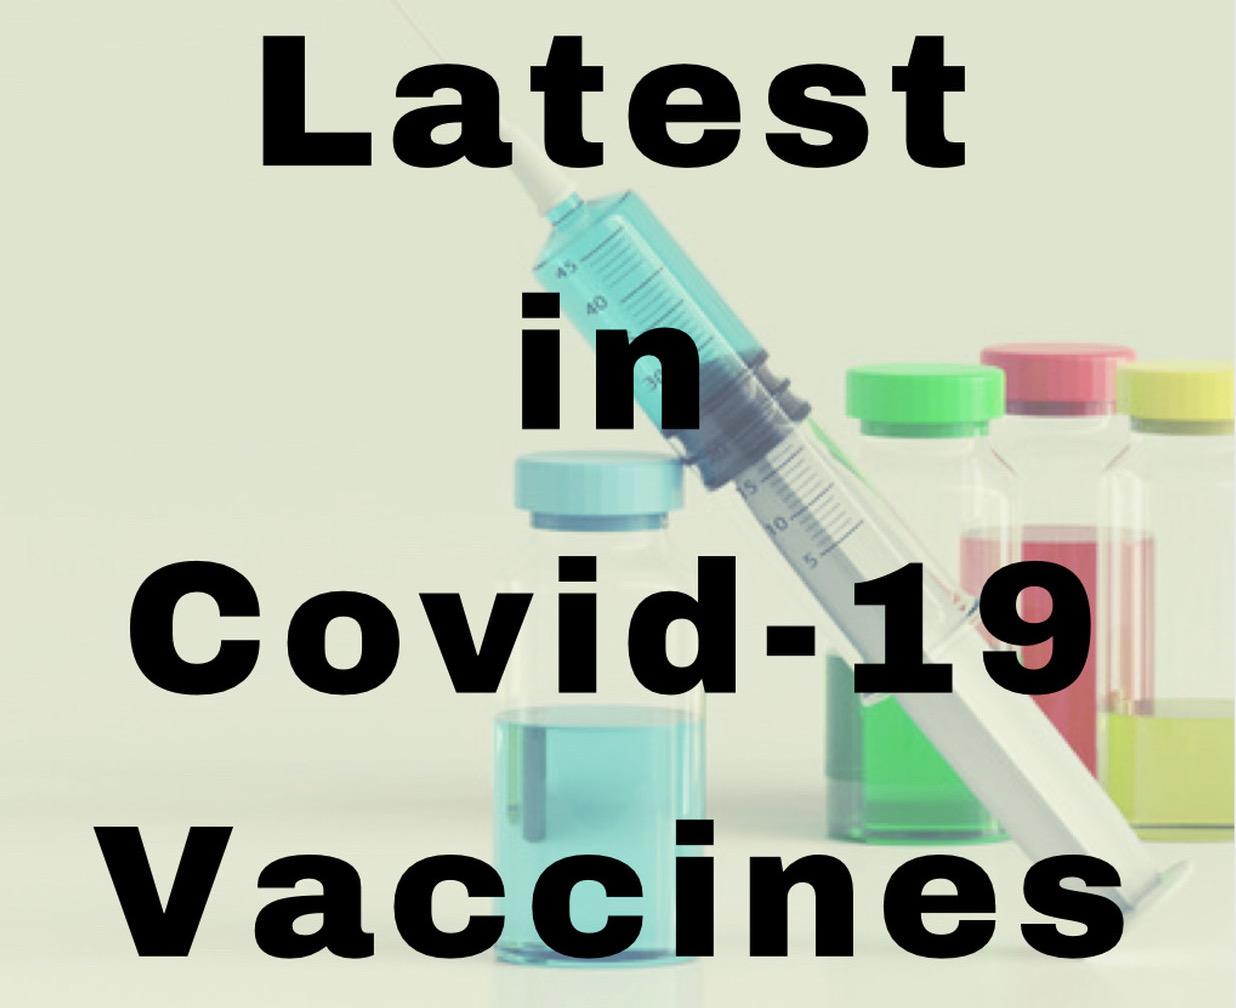 S2Ep1 - Covid-19 Vaccines